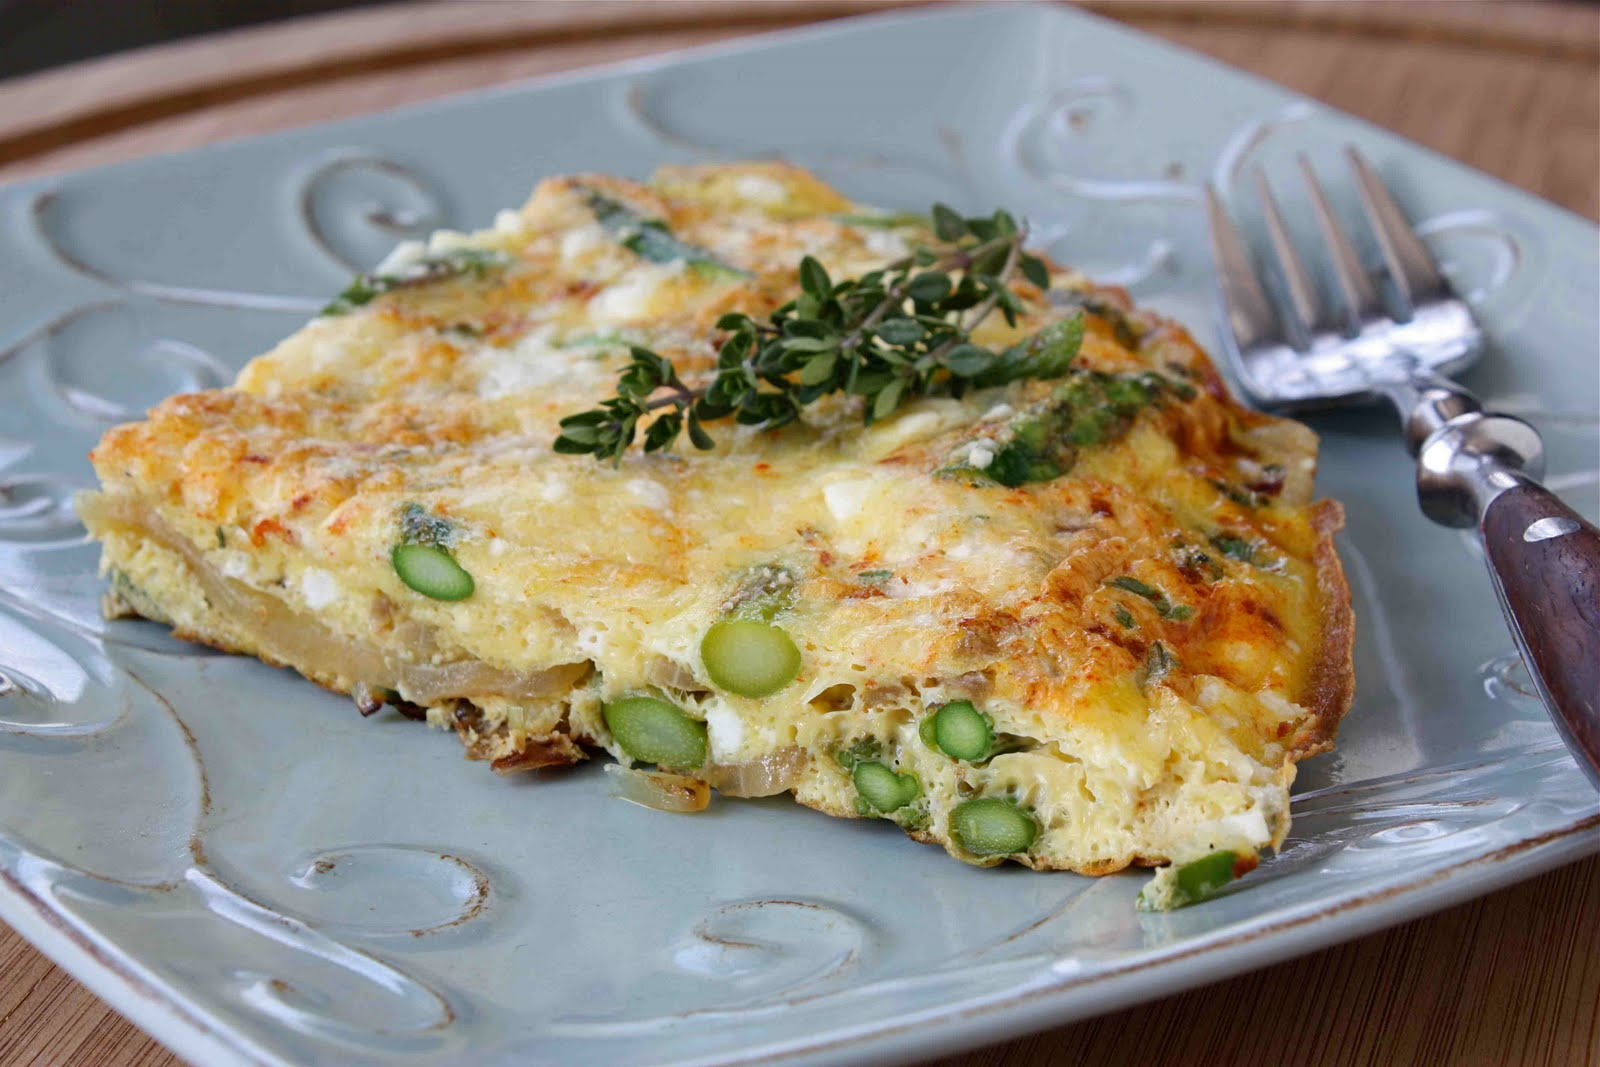 Asparagus Frittata Recipe with Smoked Paprika, Thyme & Feta Cheese